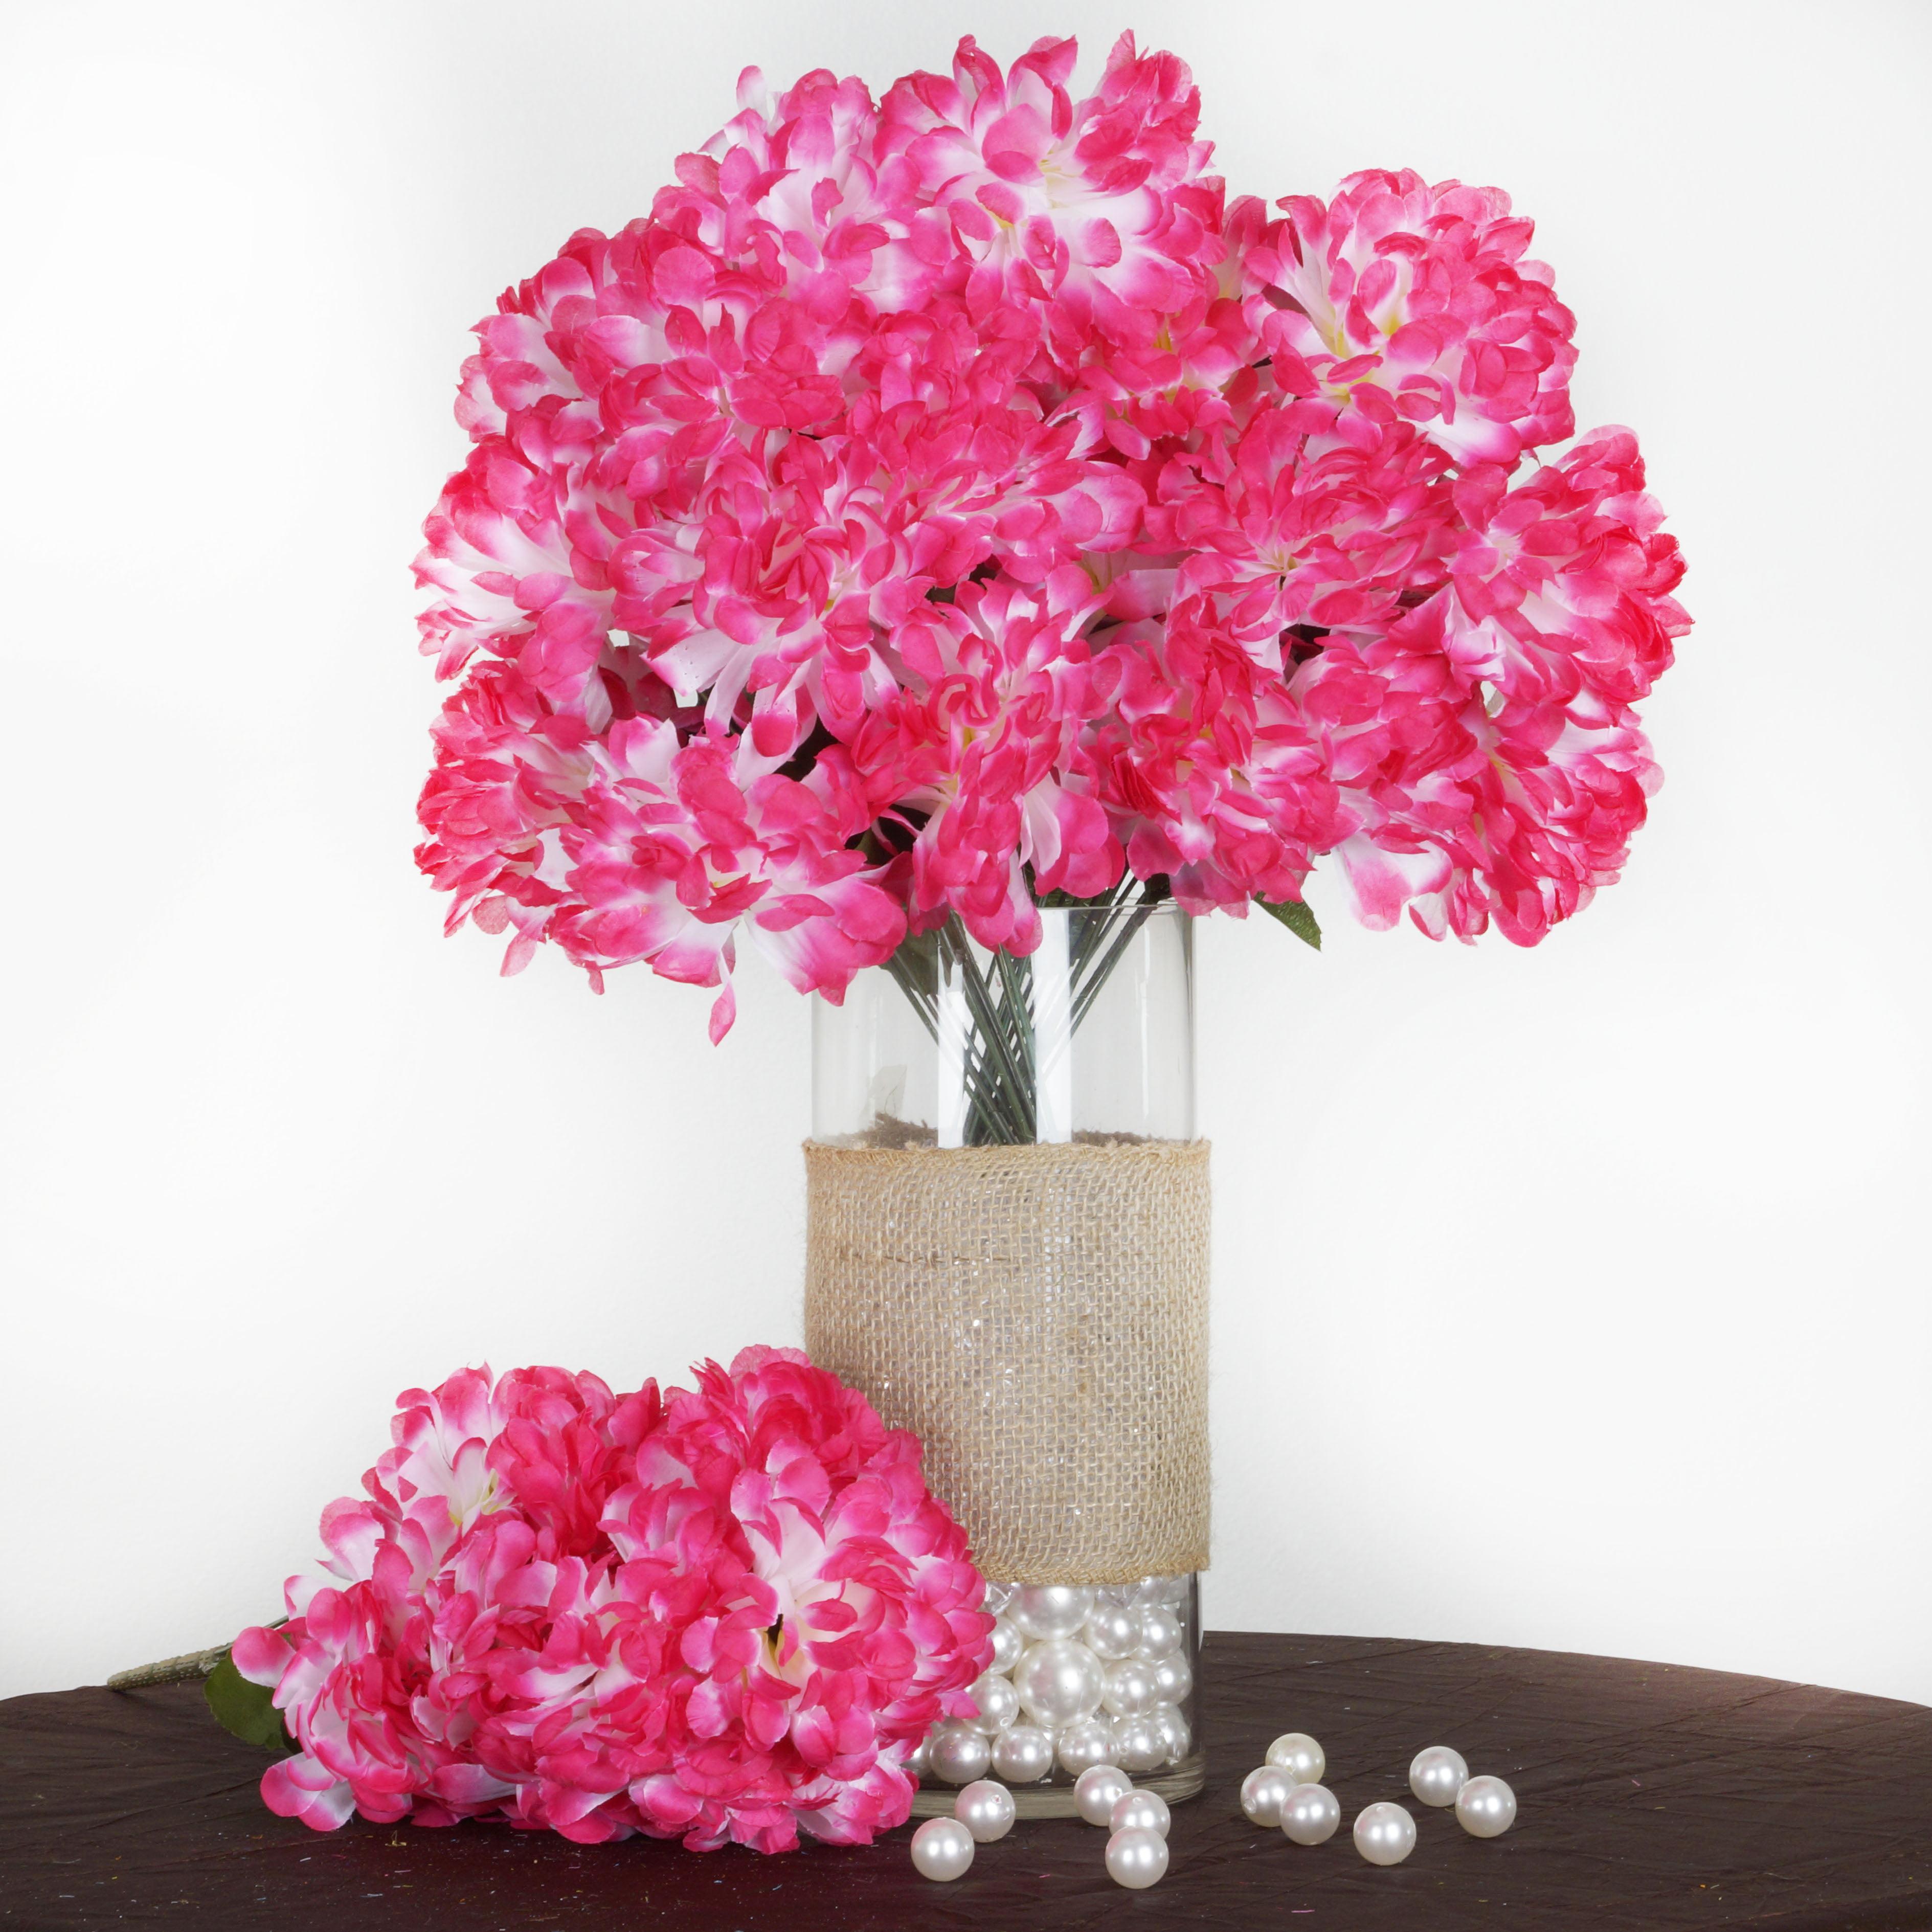 BalsaCircle 56 Large Chrysanthemum Mums Balls Silk Flowers - DIY Home Wedding Party Artificial Bouquets Arrangements Centerpieces